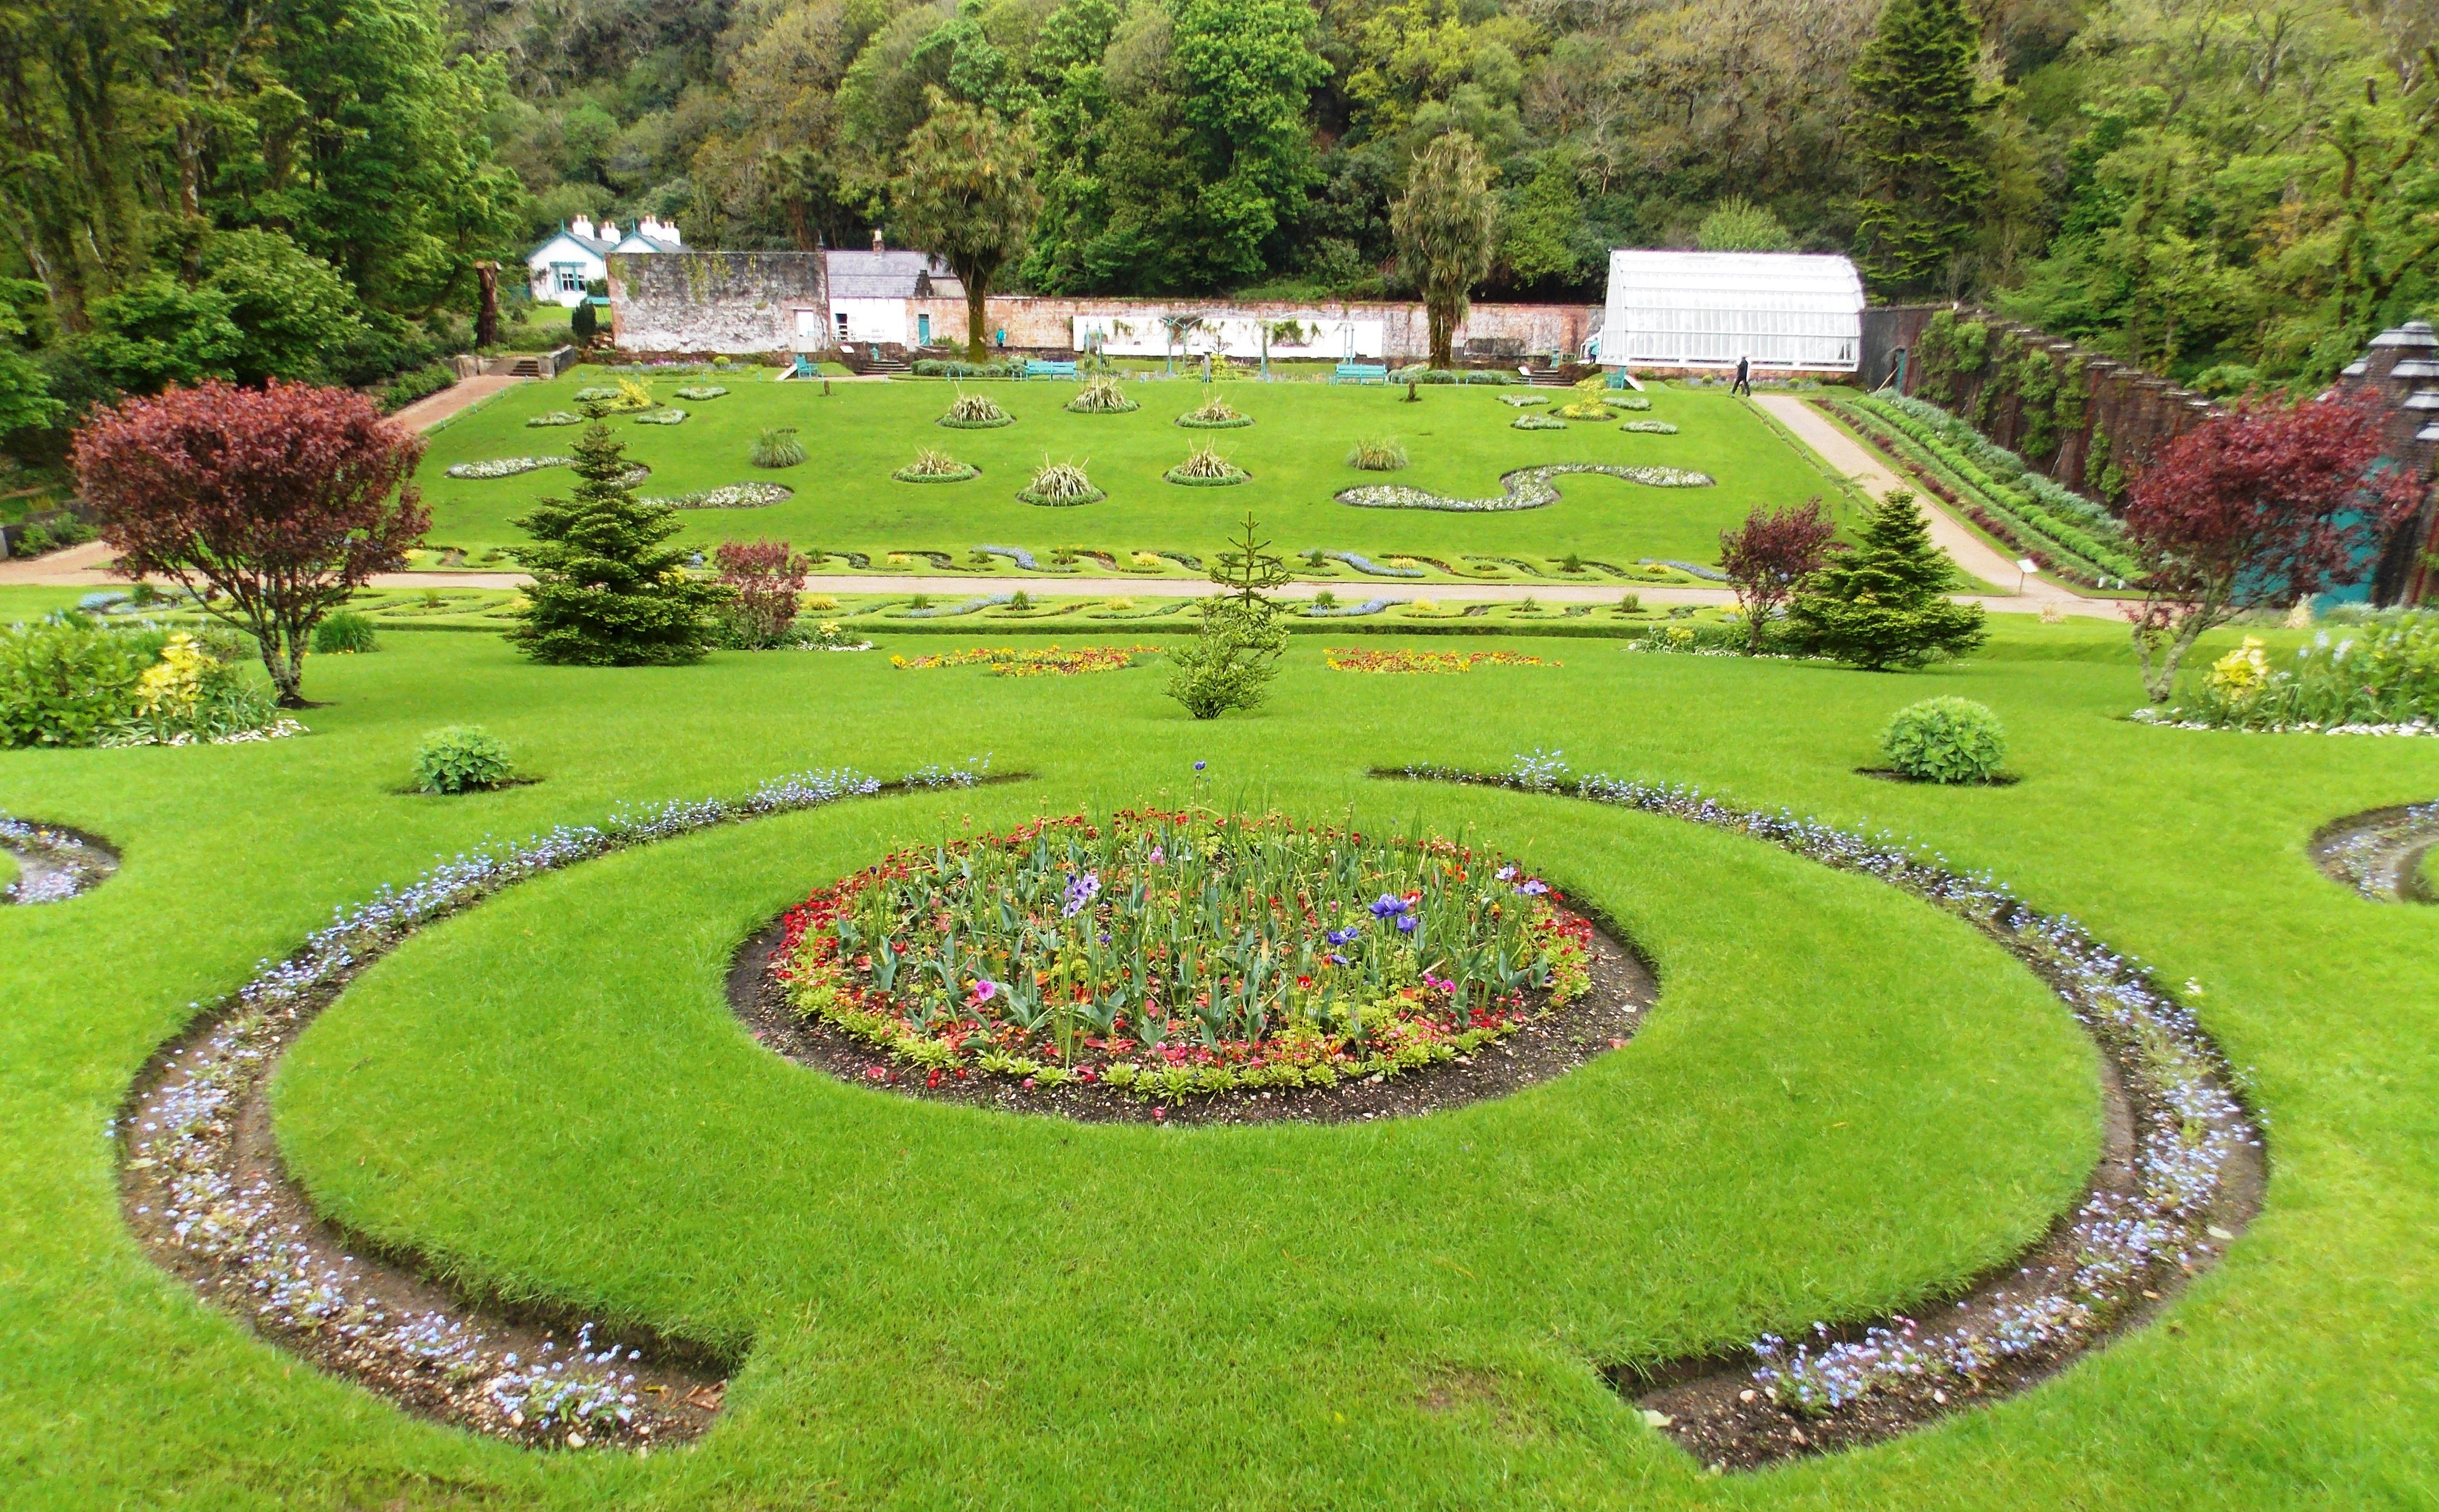 Gardens at Kylemore Abbey, Connemara, Ireland | Landscape ...